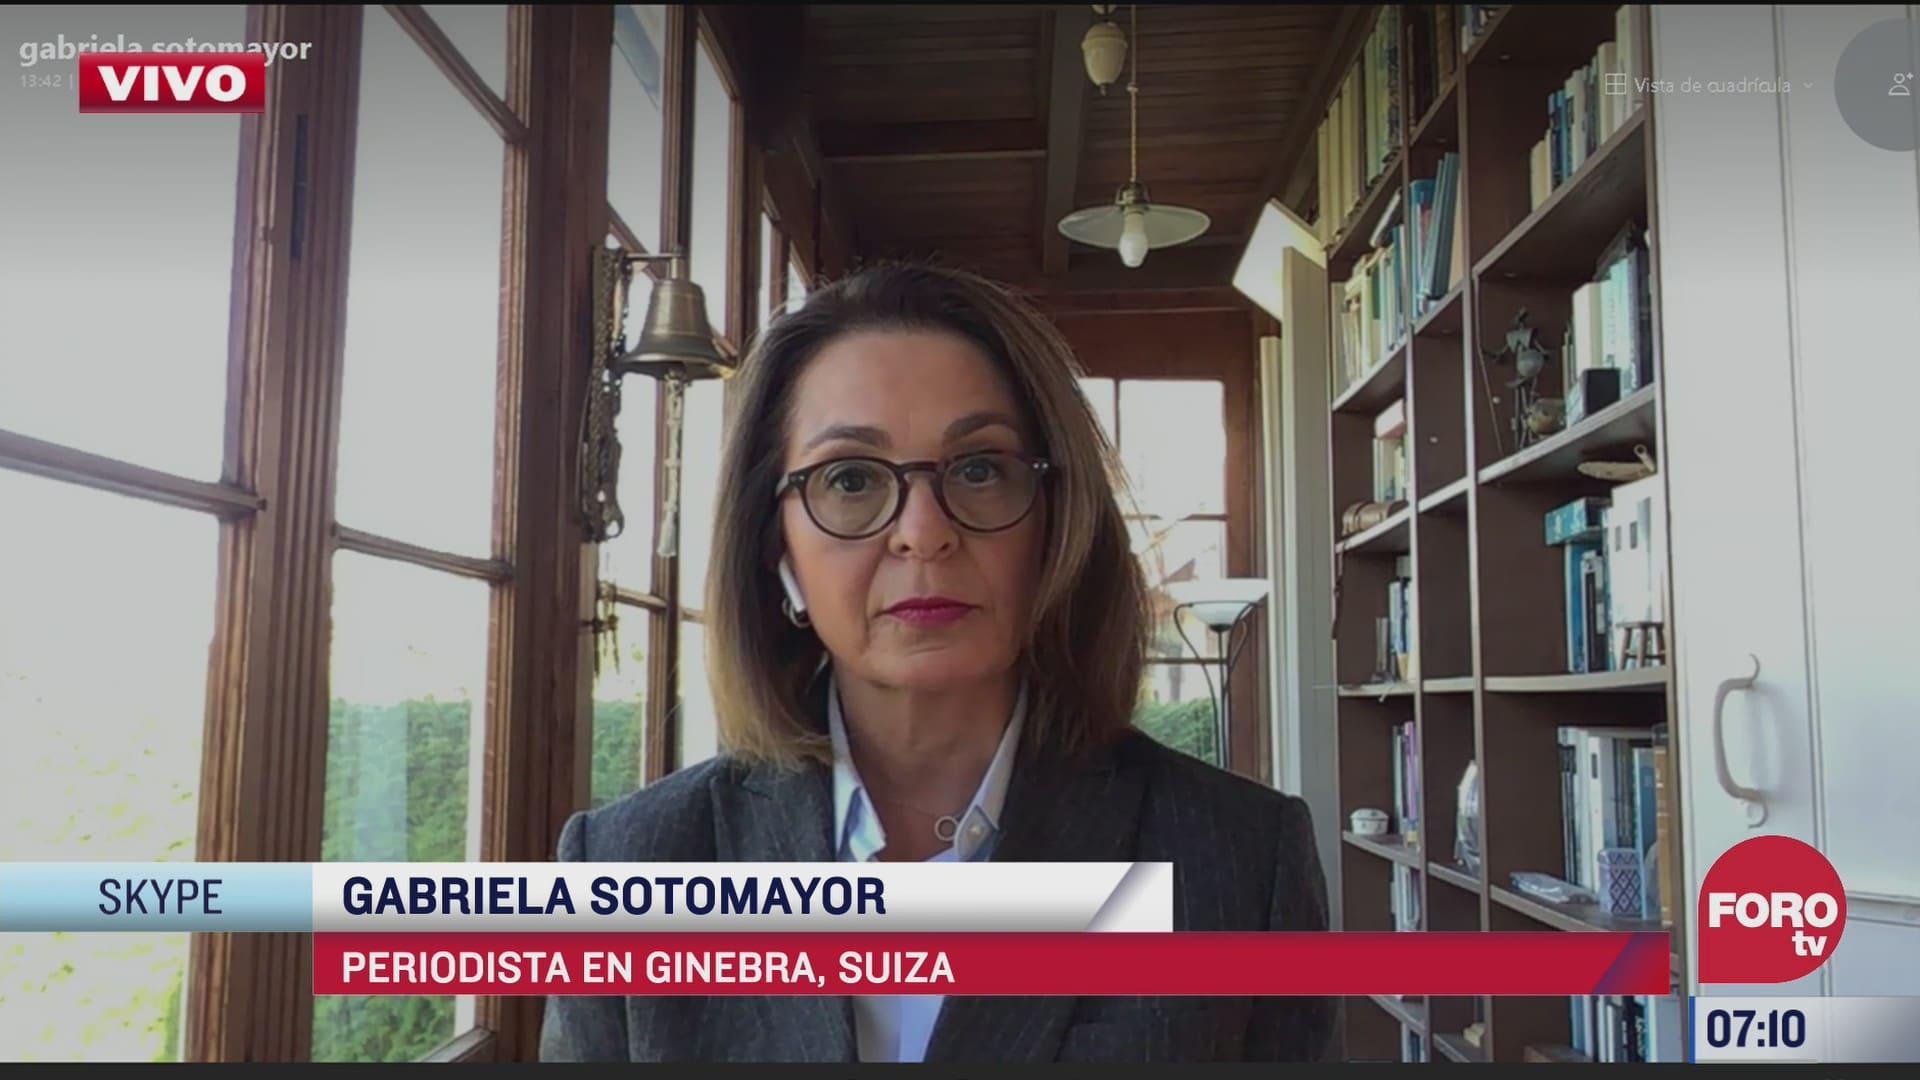 oms responde a mexico sobre aprobacion de vacunas contra covid de sputnik v y cansino